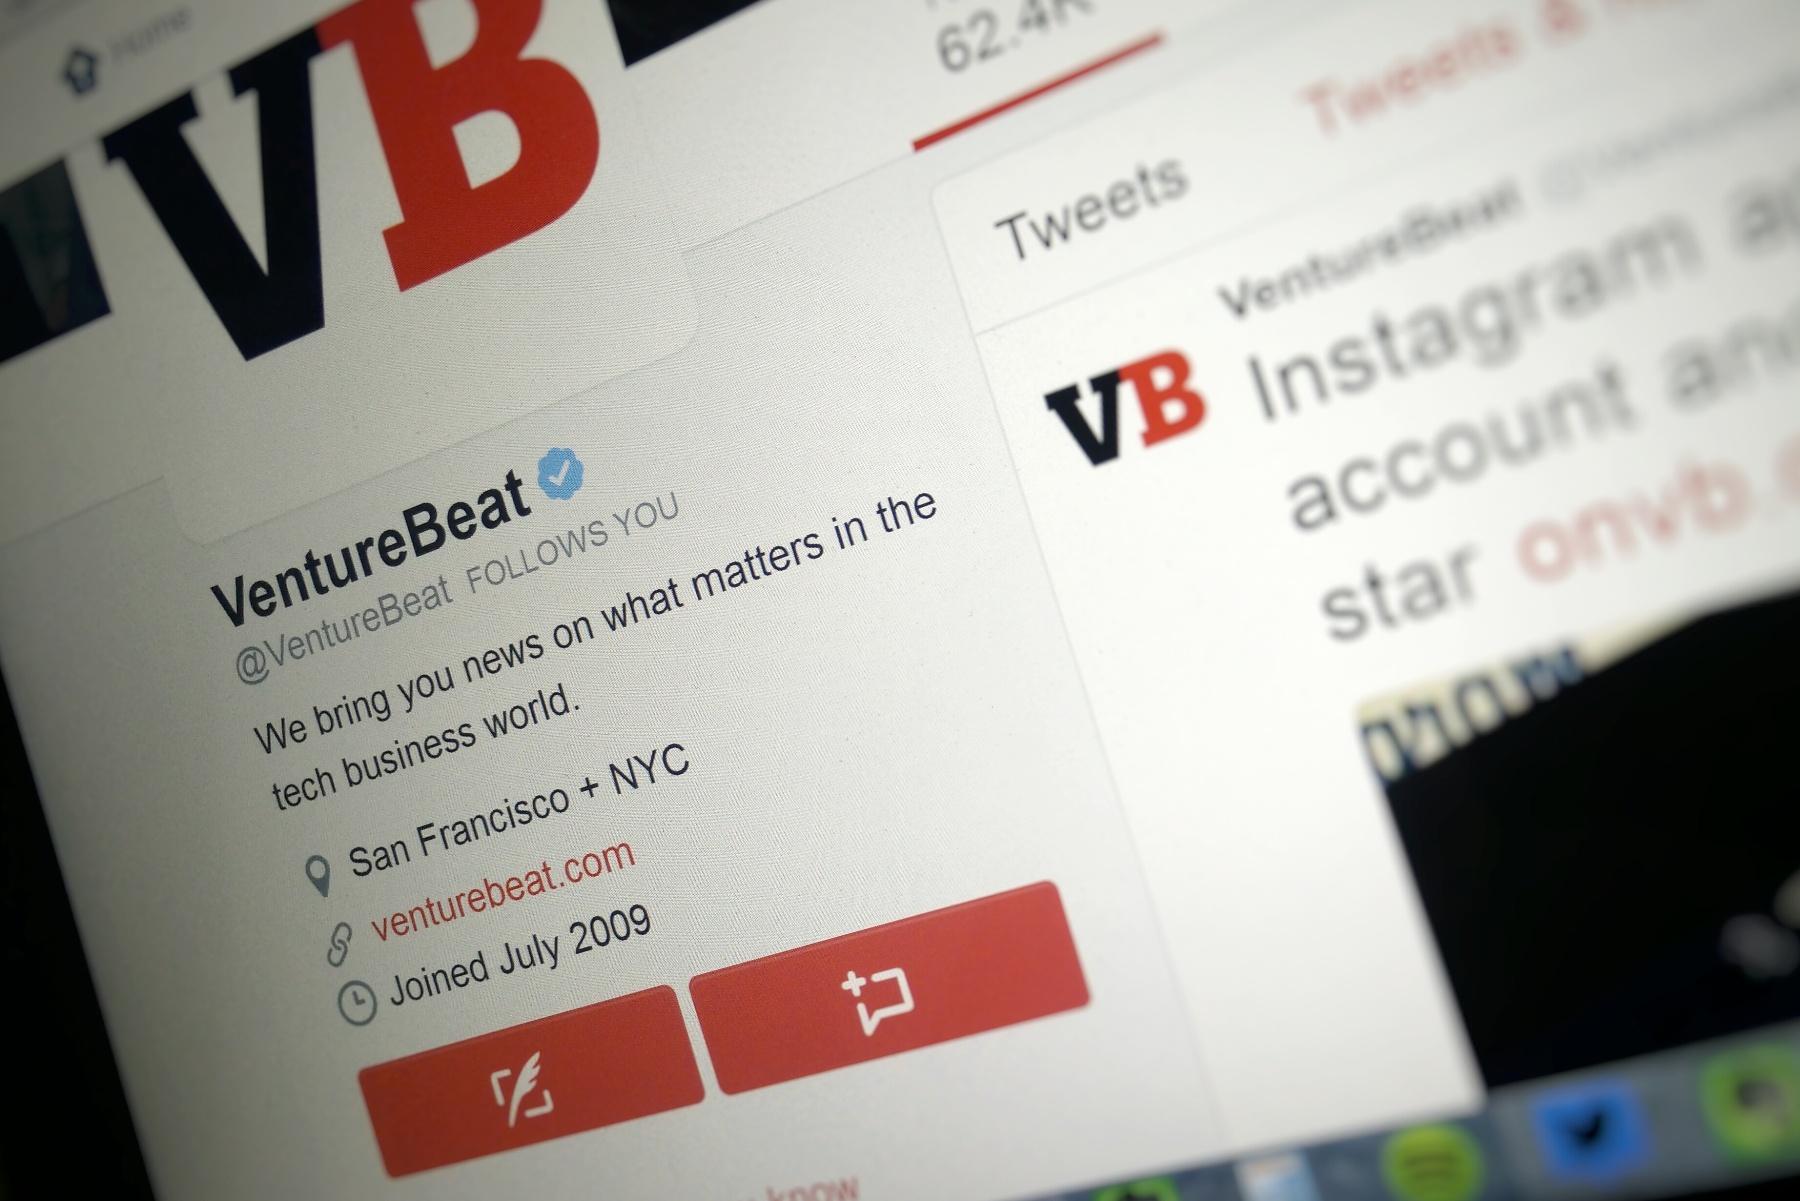 VentureBeat is Looking for a Social Media Contractor